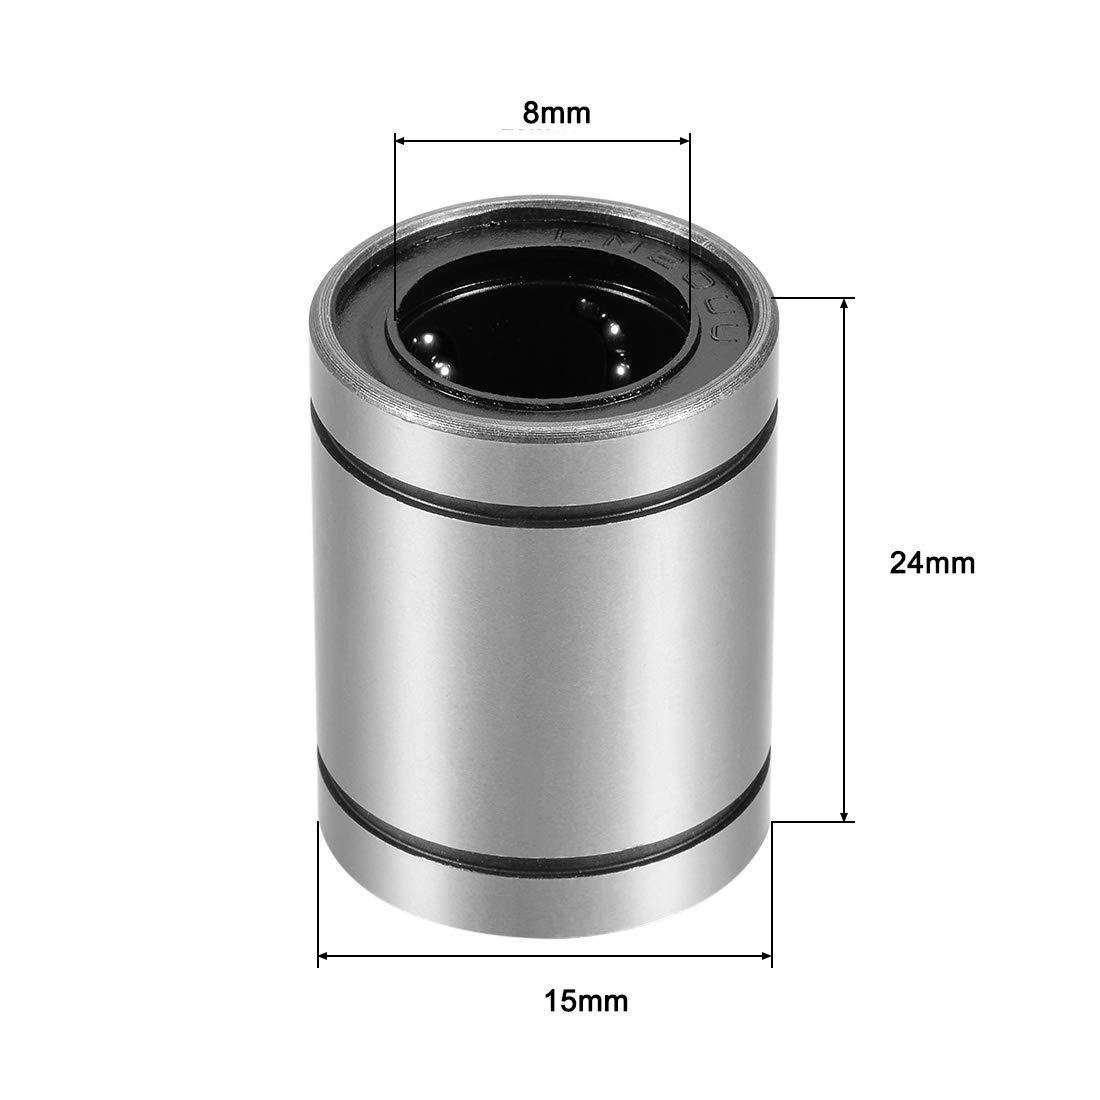 Gekufa LM8UU Linear Ball Bearing Bush Bushing Fit for 8mm Rod Reprap Prusa 3D Printer Pack of 12